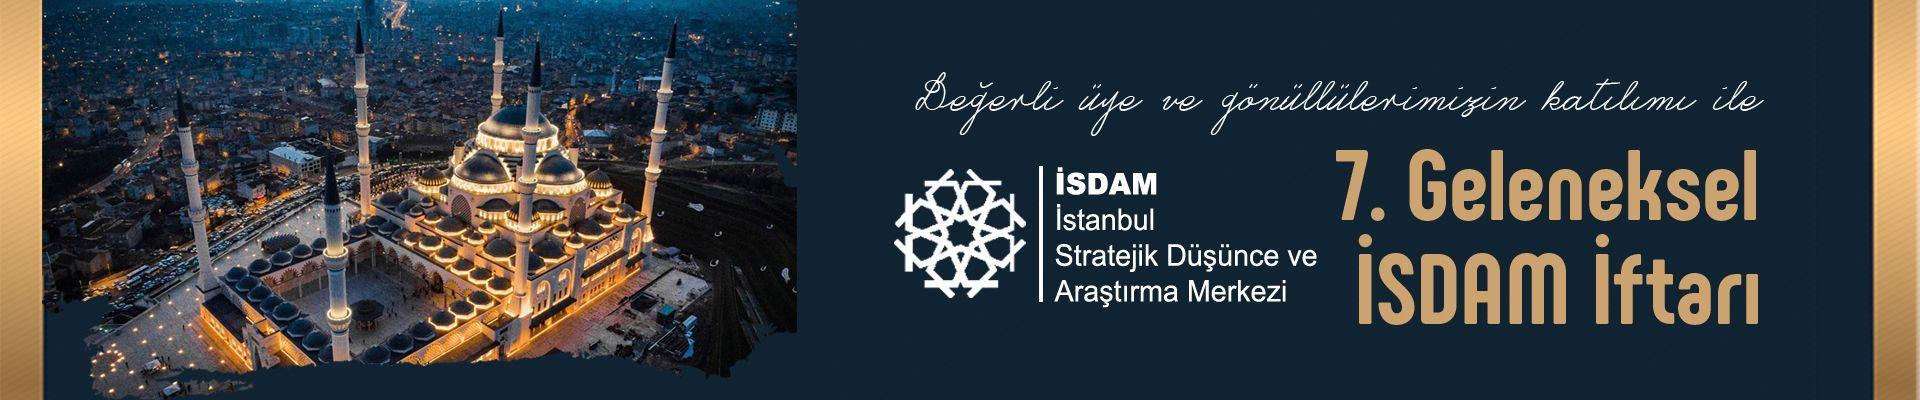 isdam iftar 2019